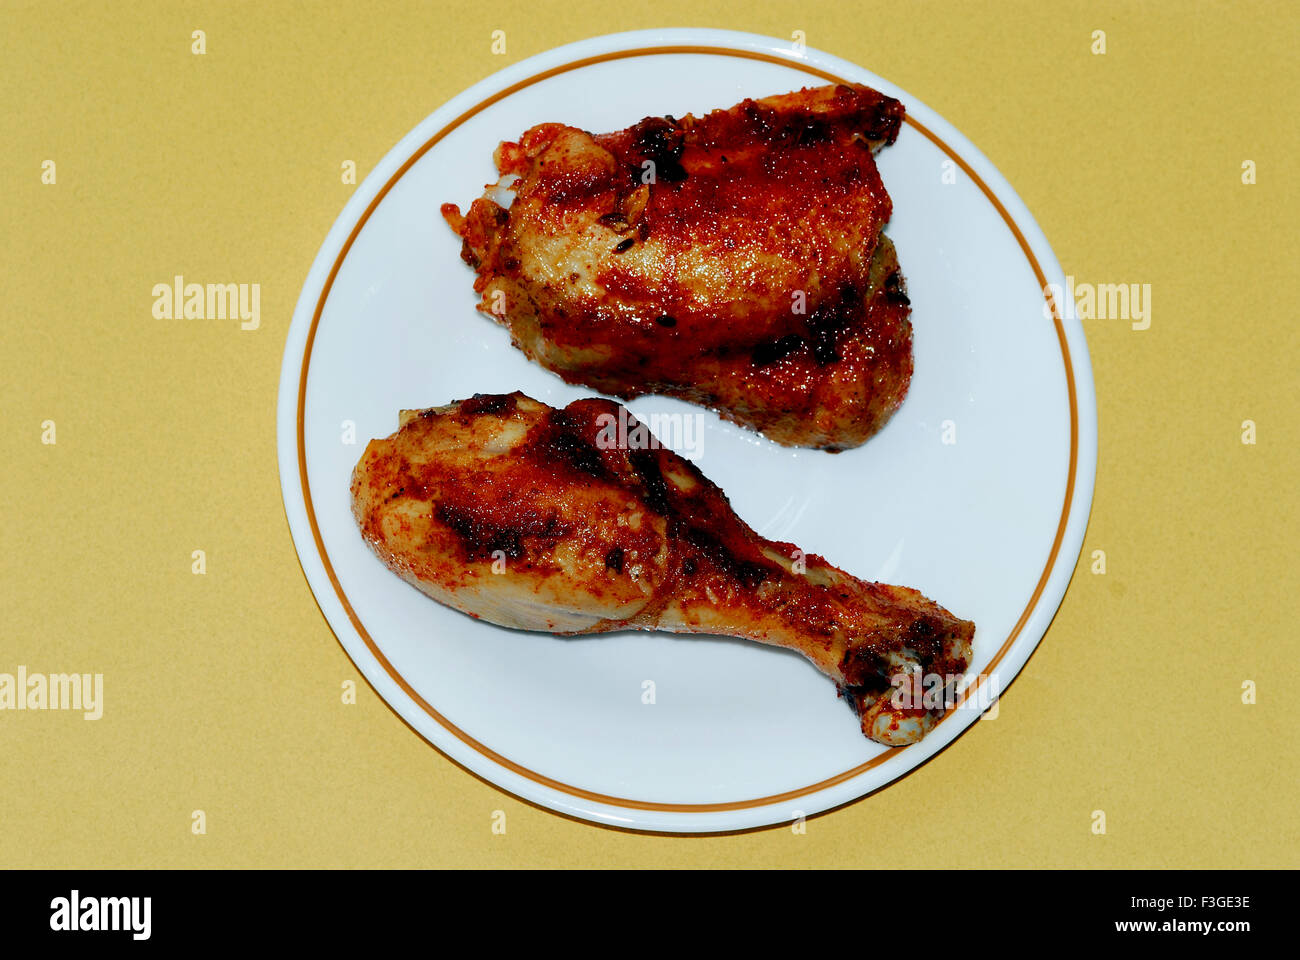 Indian Non Vegetarian Food Grilled Chicken Legs Piece Or Drum